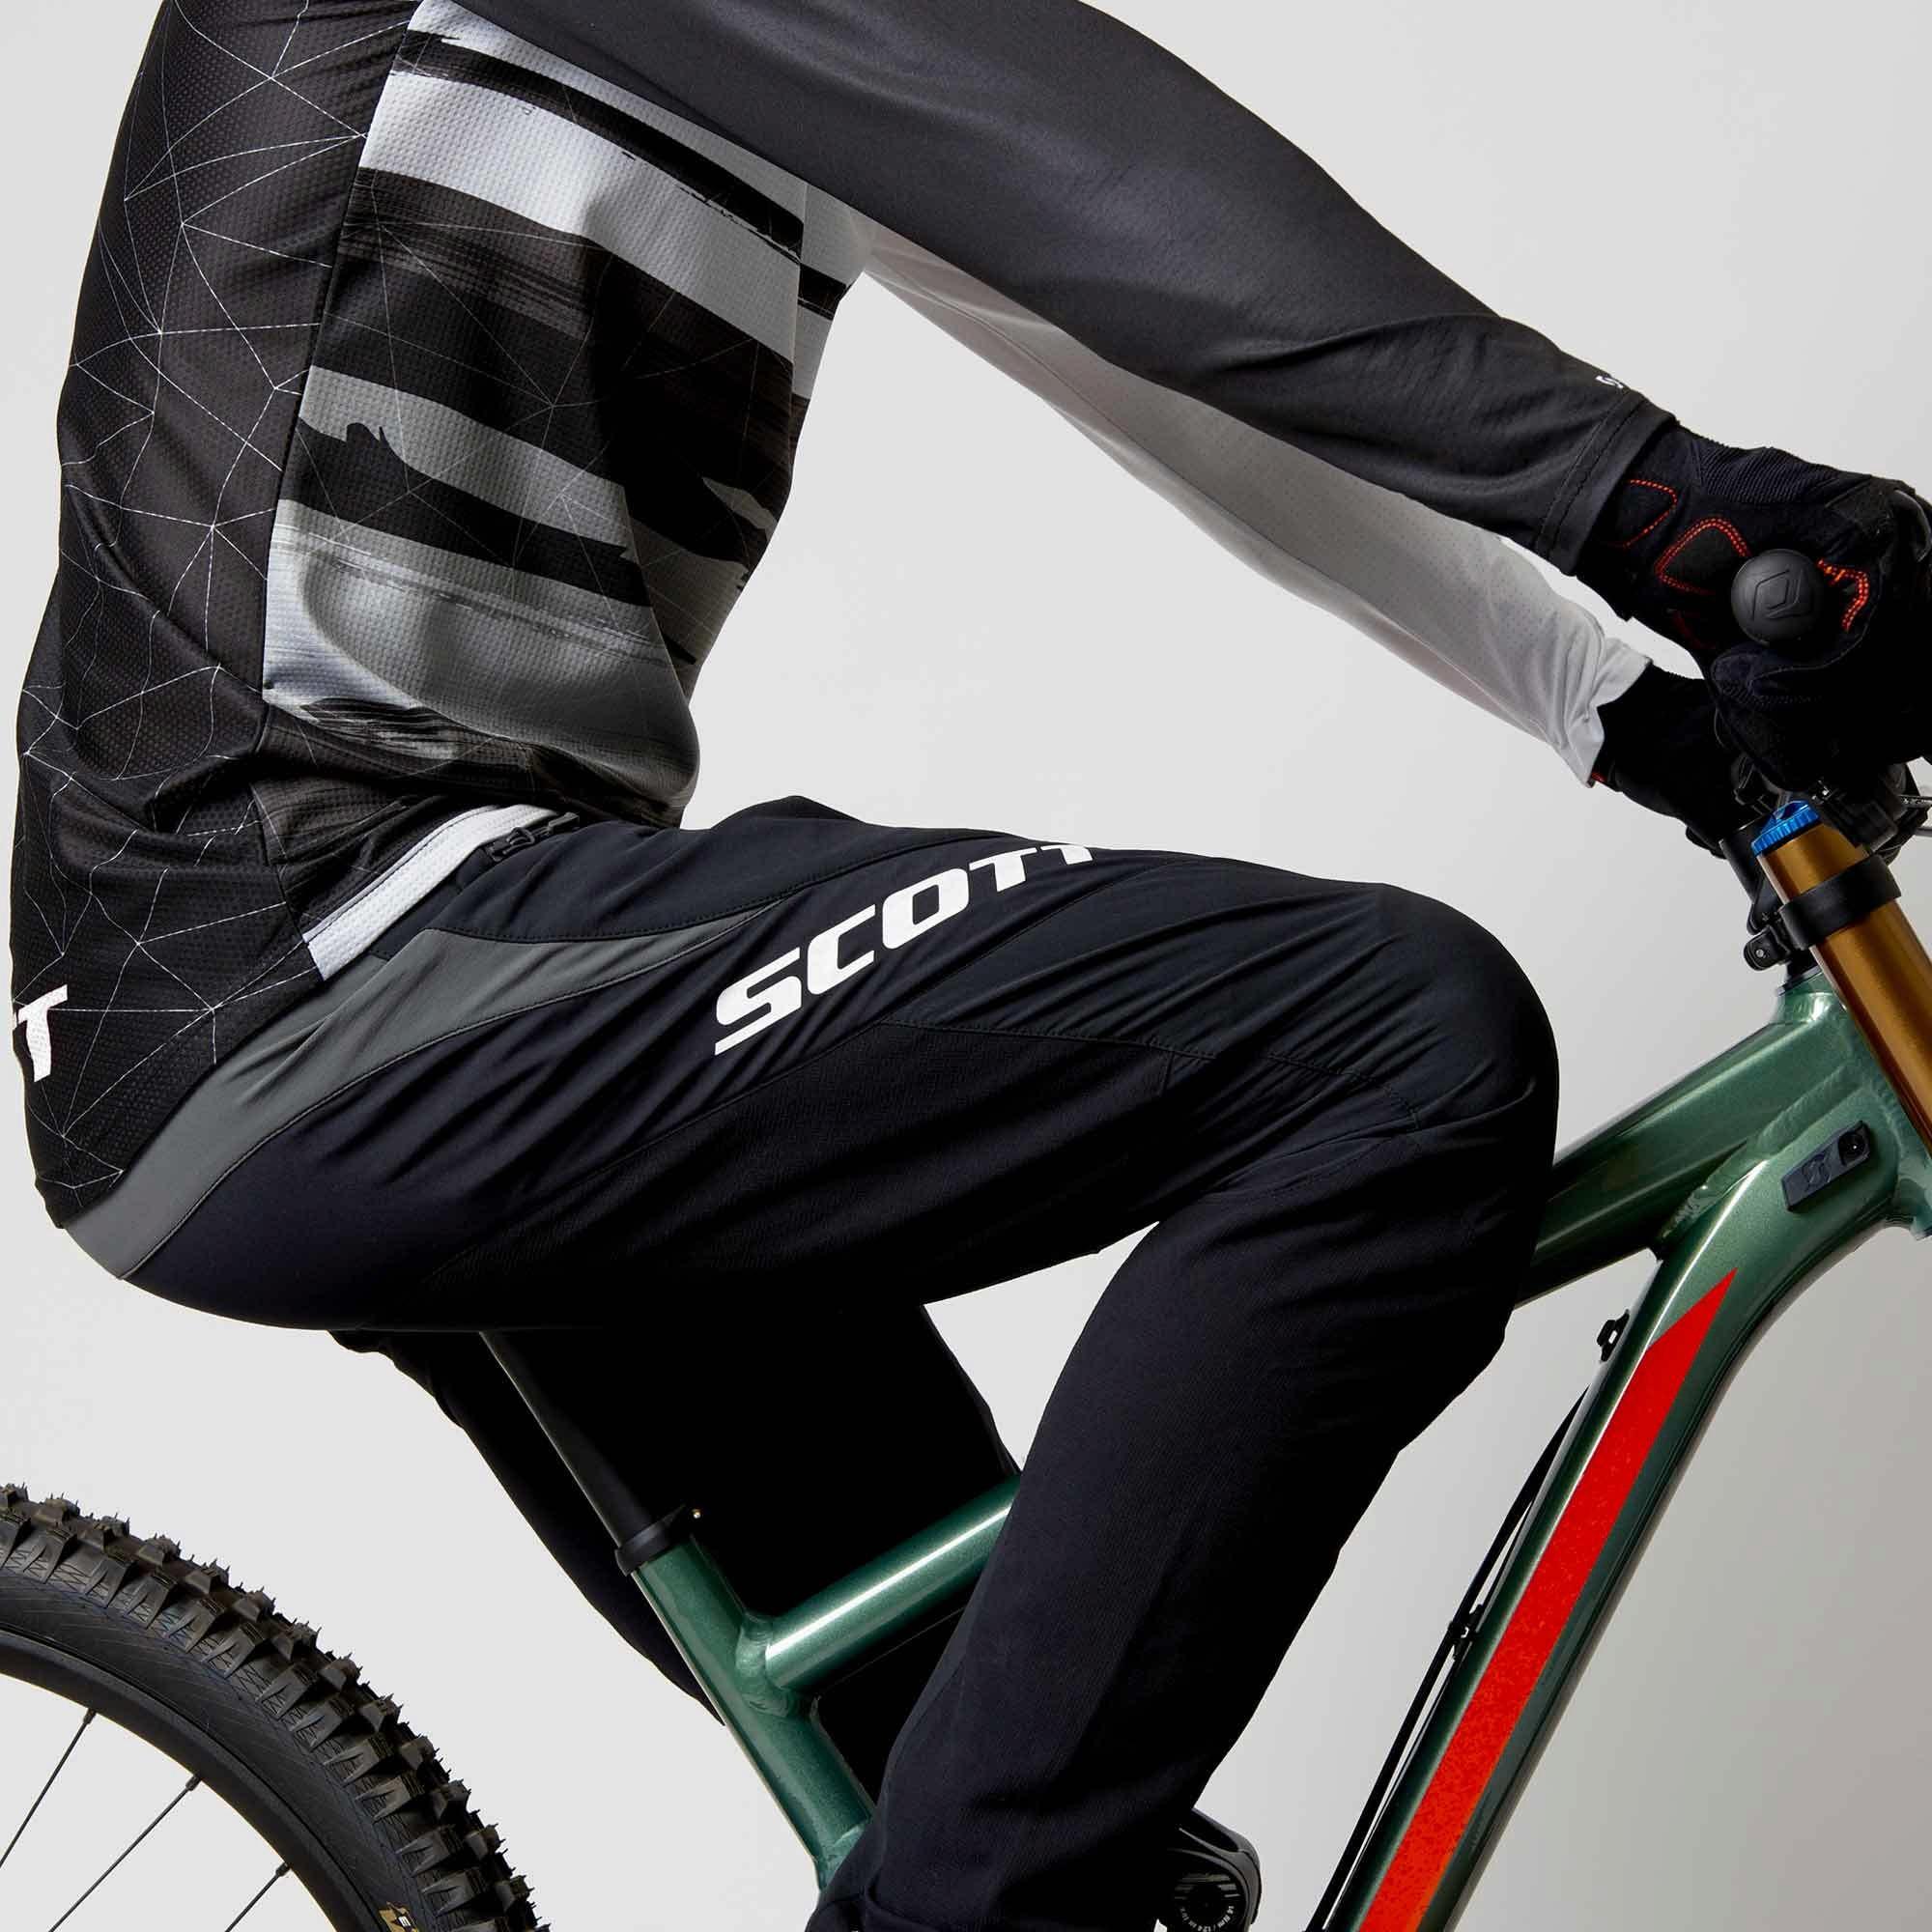 Scott Trail Tuned Mens Biking Pants Pants Bike Clothing